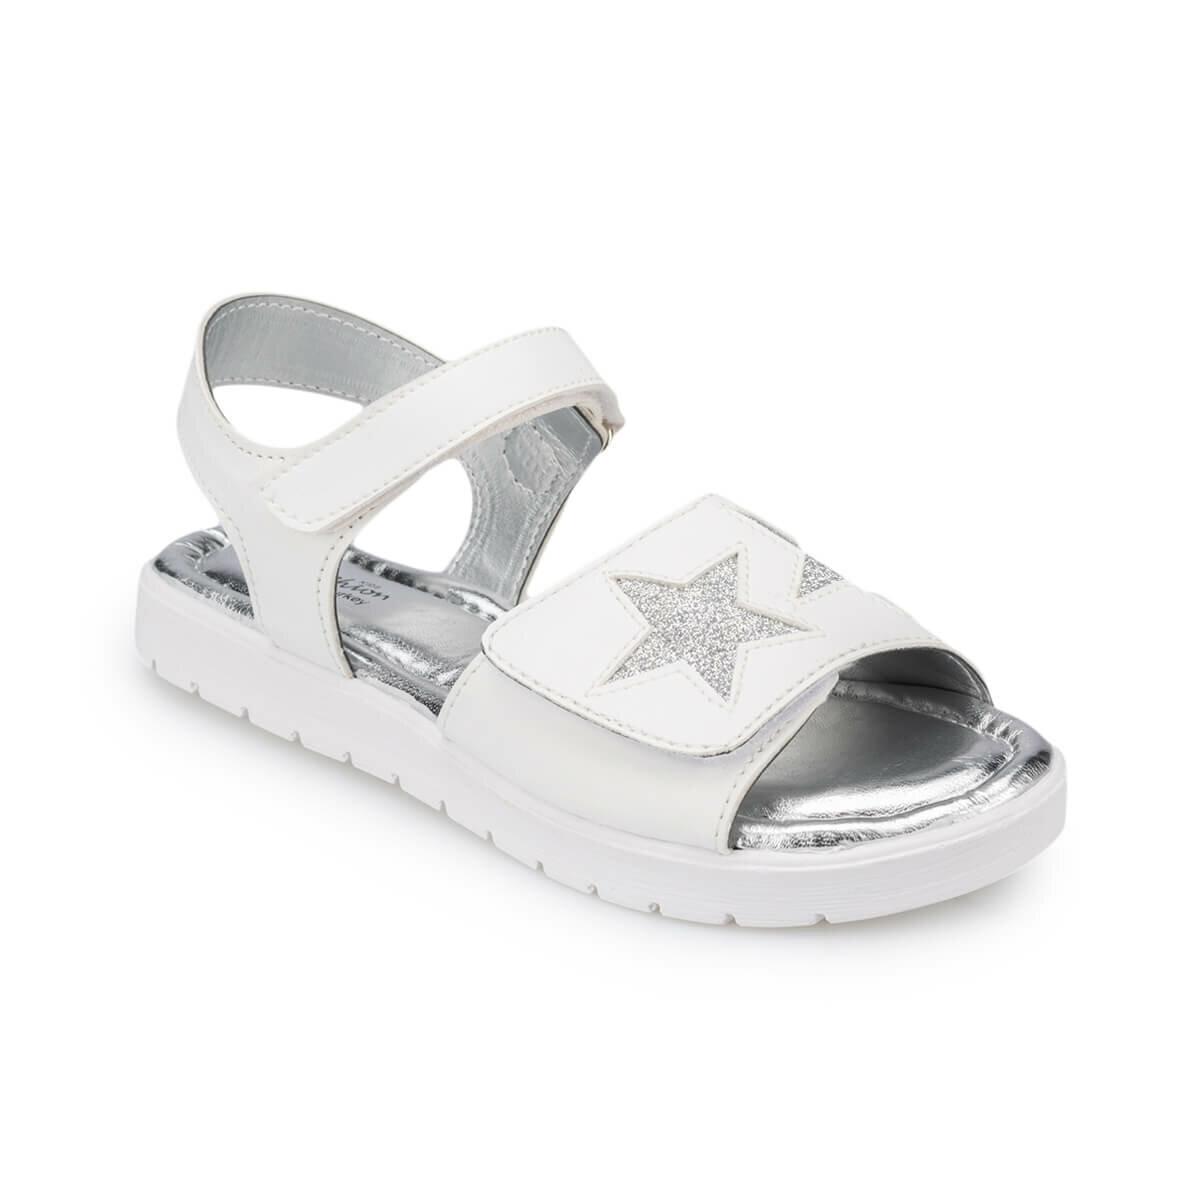 FLO 91.511280.F White Female Child Sandals Polaris